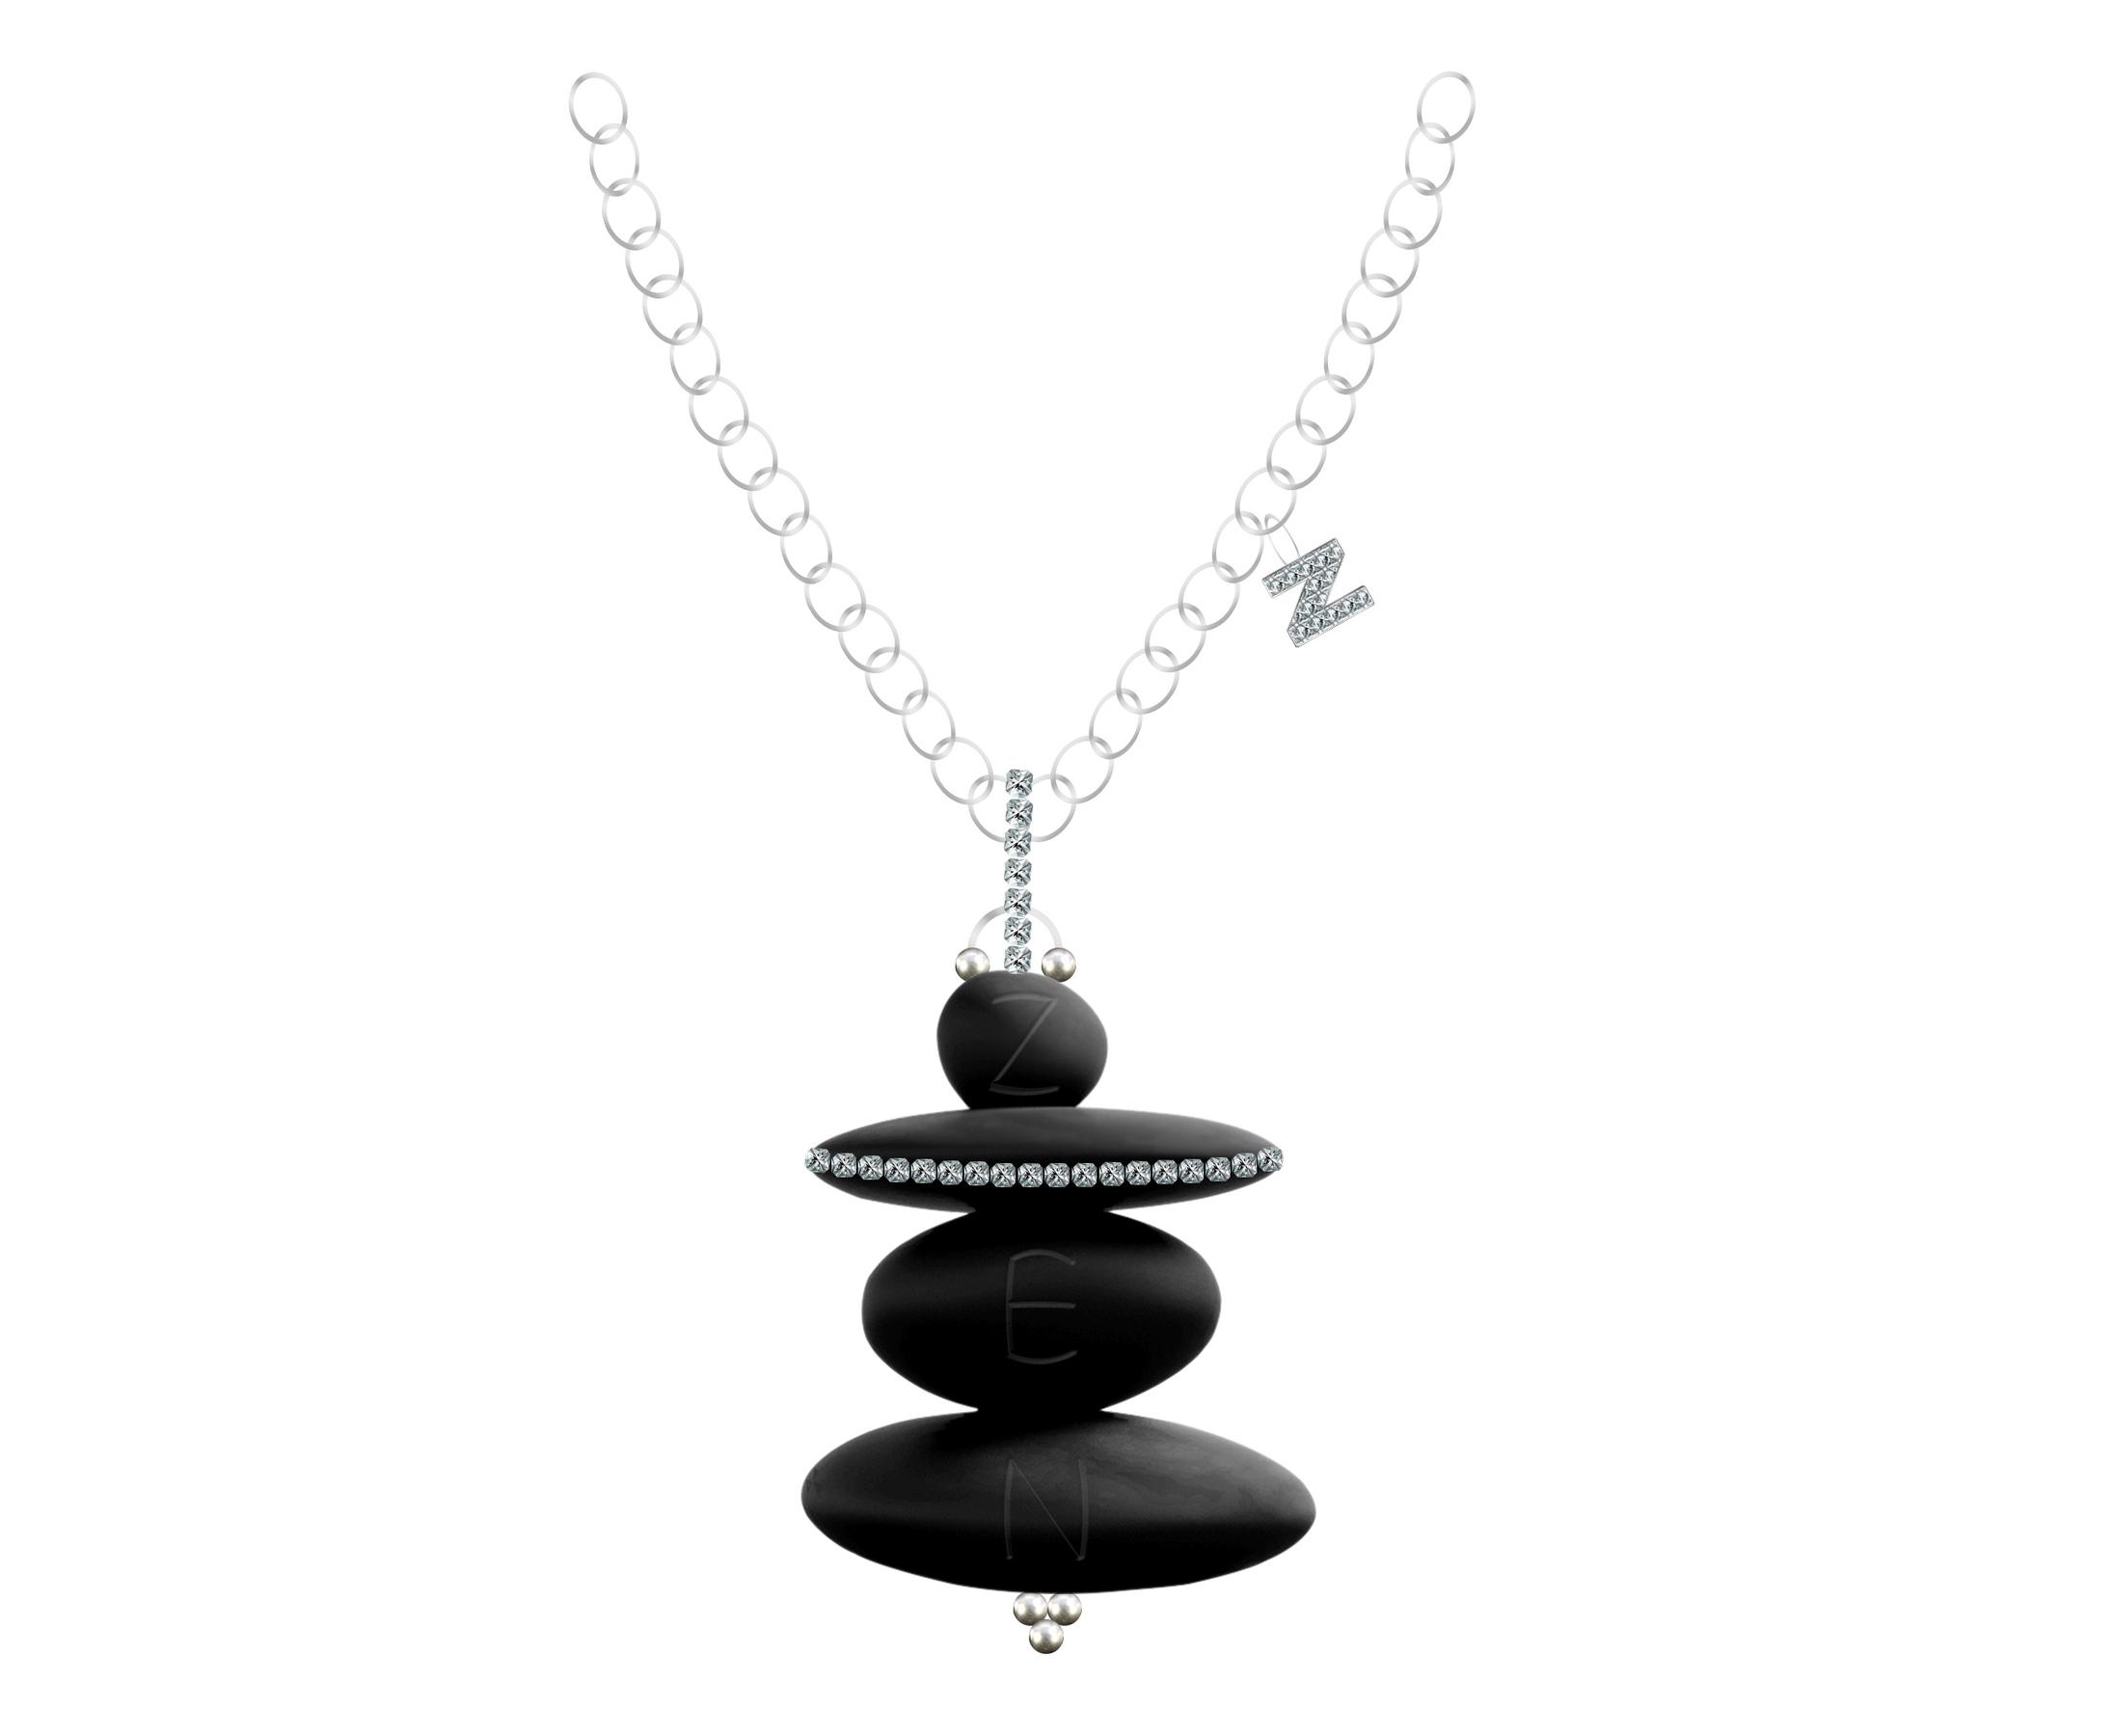 Zen Designer Necklace by Steven Zale